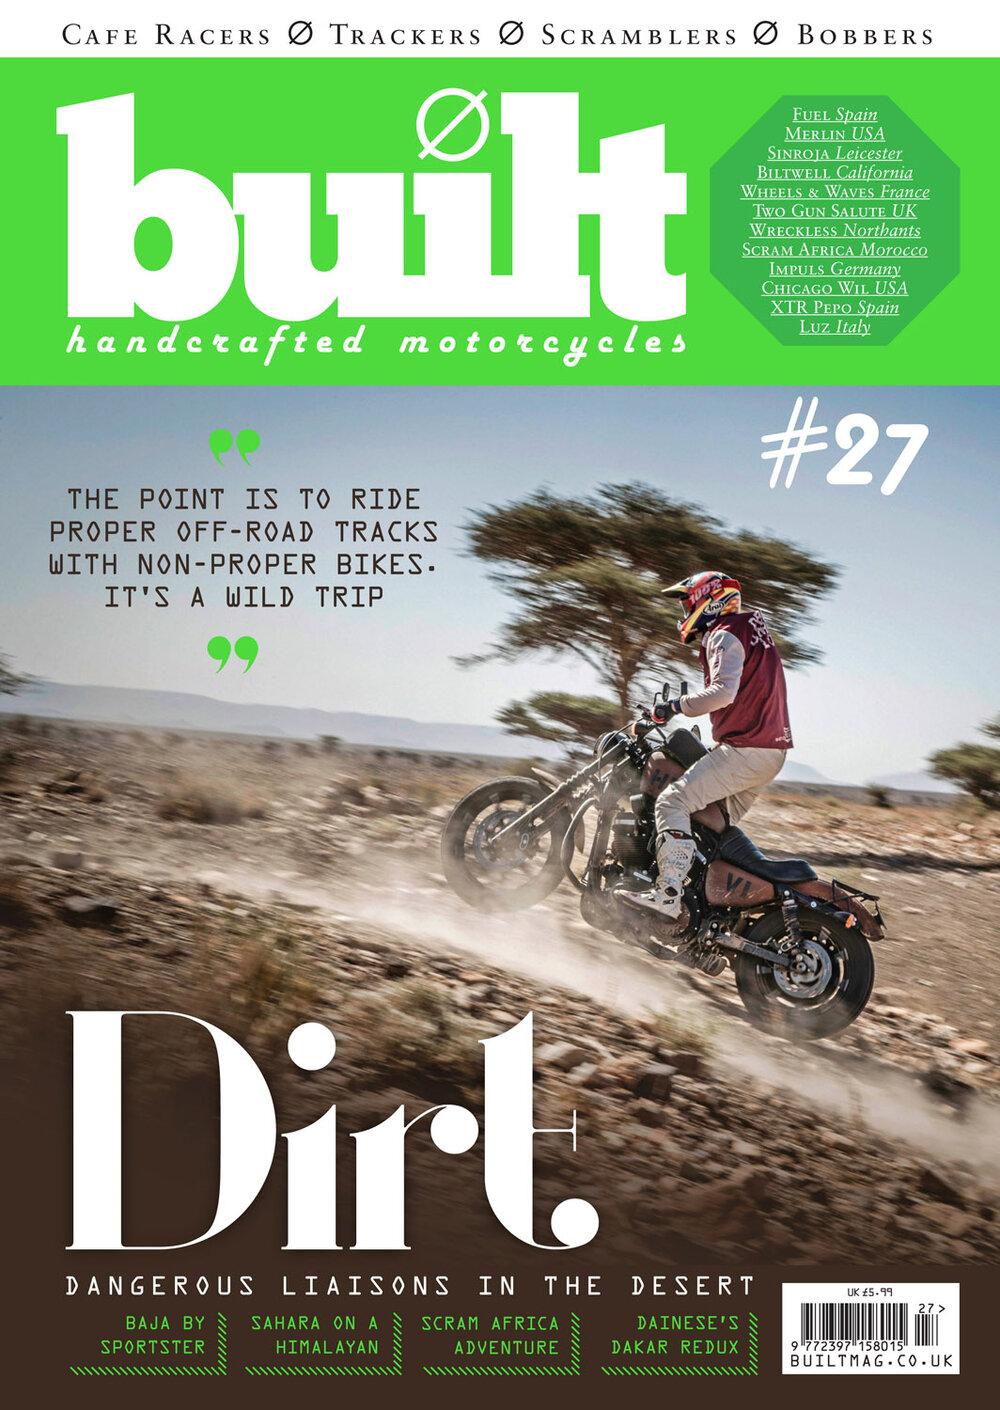 Built Magazine - Handcrafted Custom Motorcycles - MAGAZINE